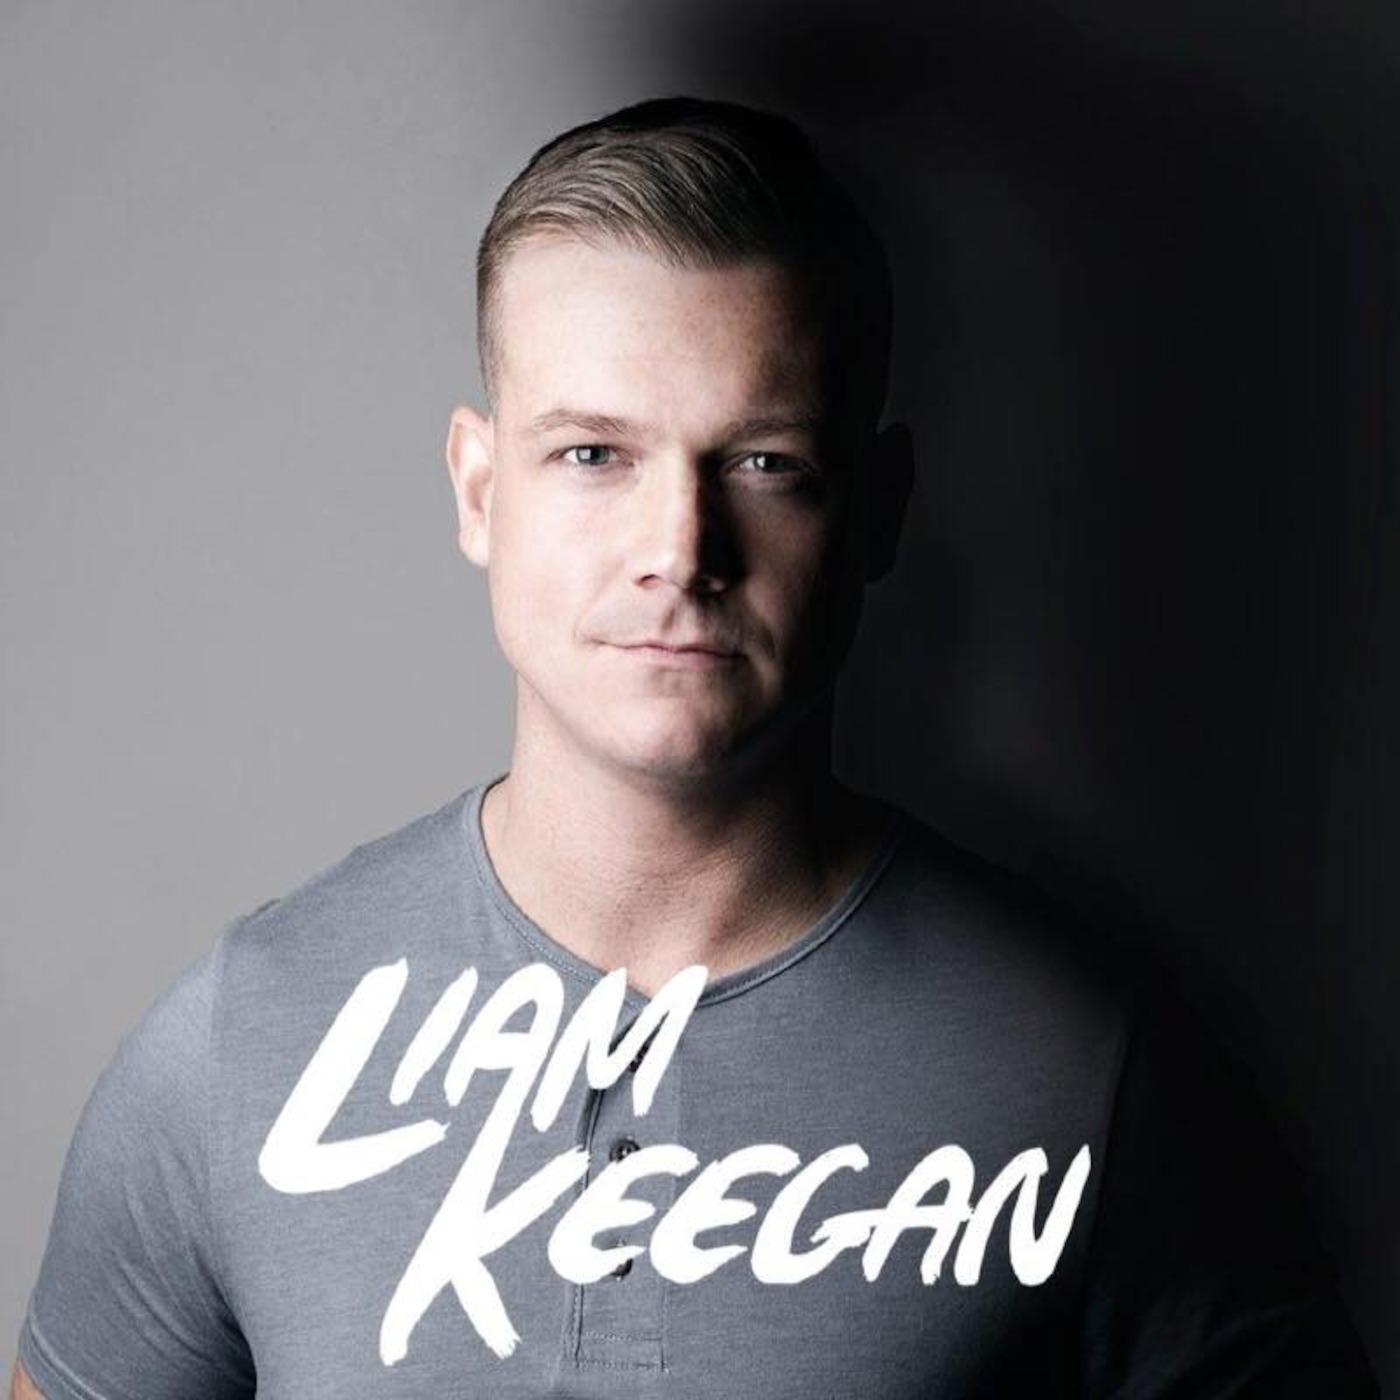 Liam Keegan Breakin' The Rules August 2018 Mix